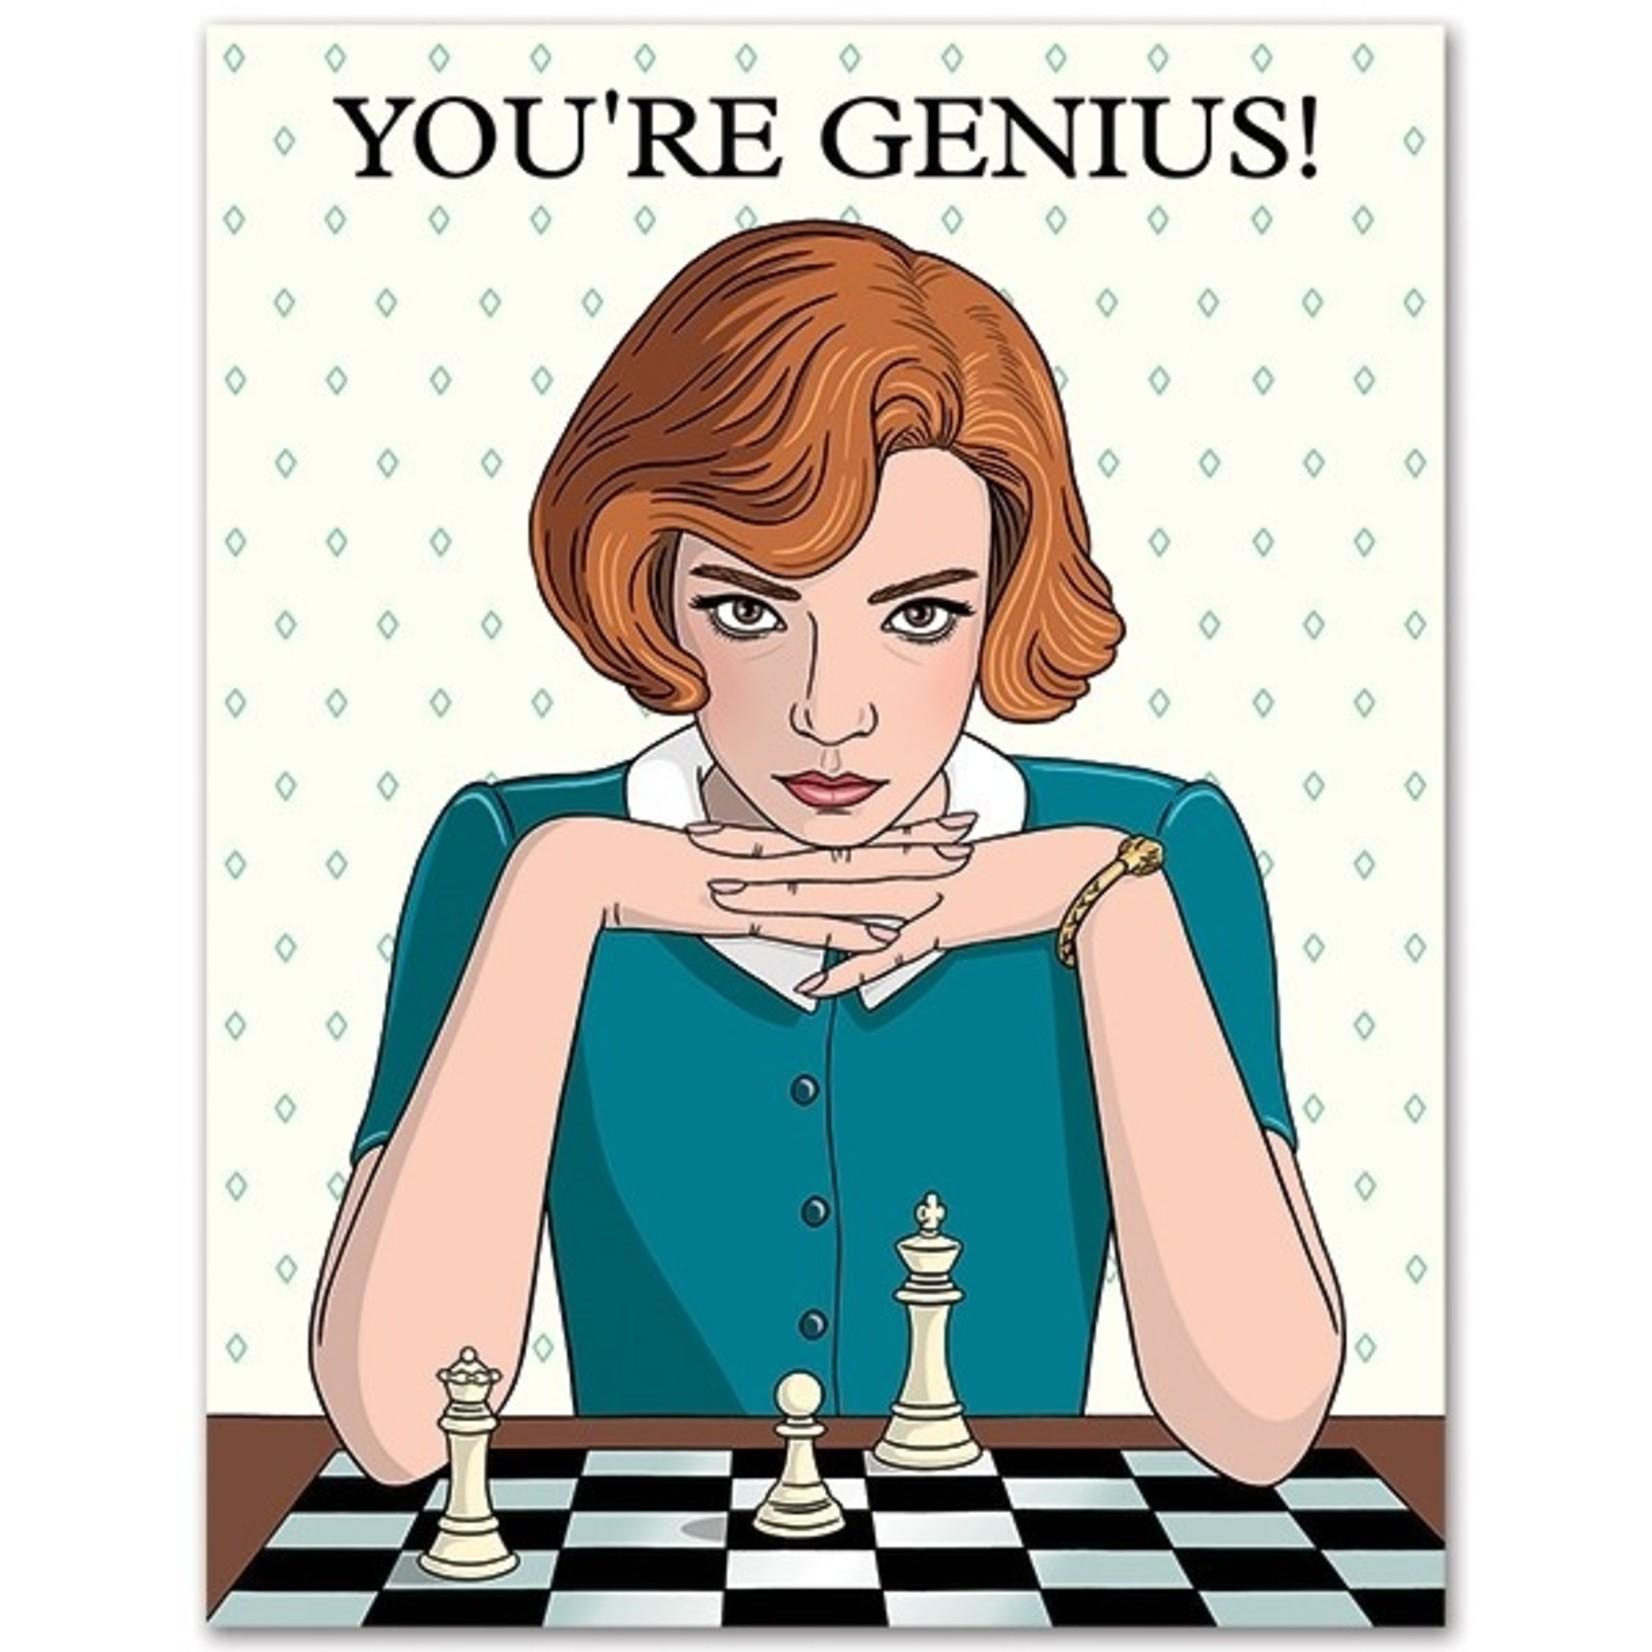 Birthday Card: You're Genius!